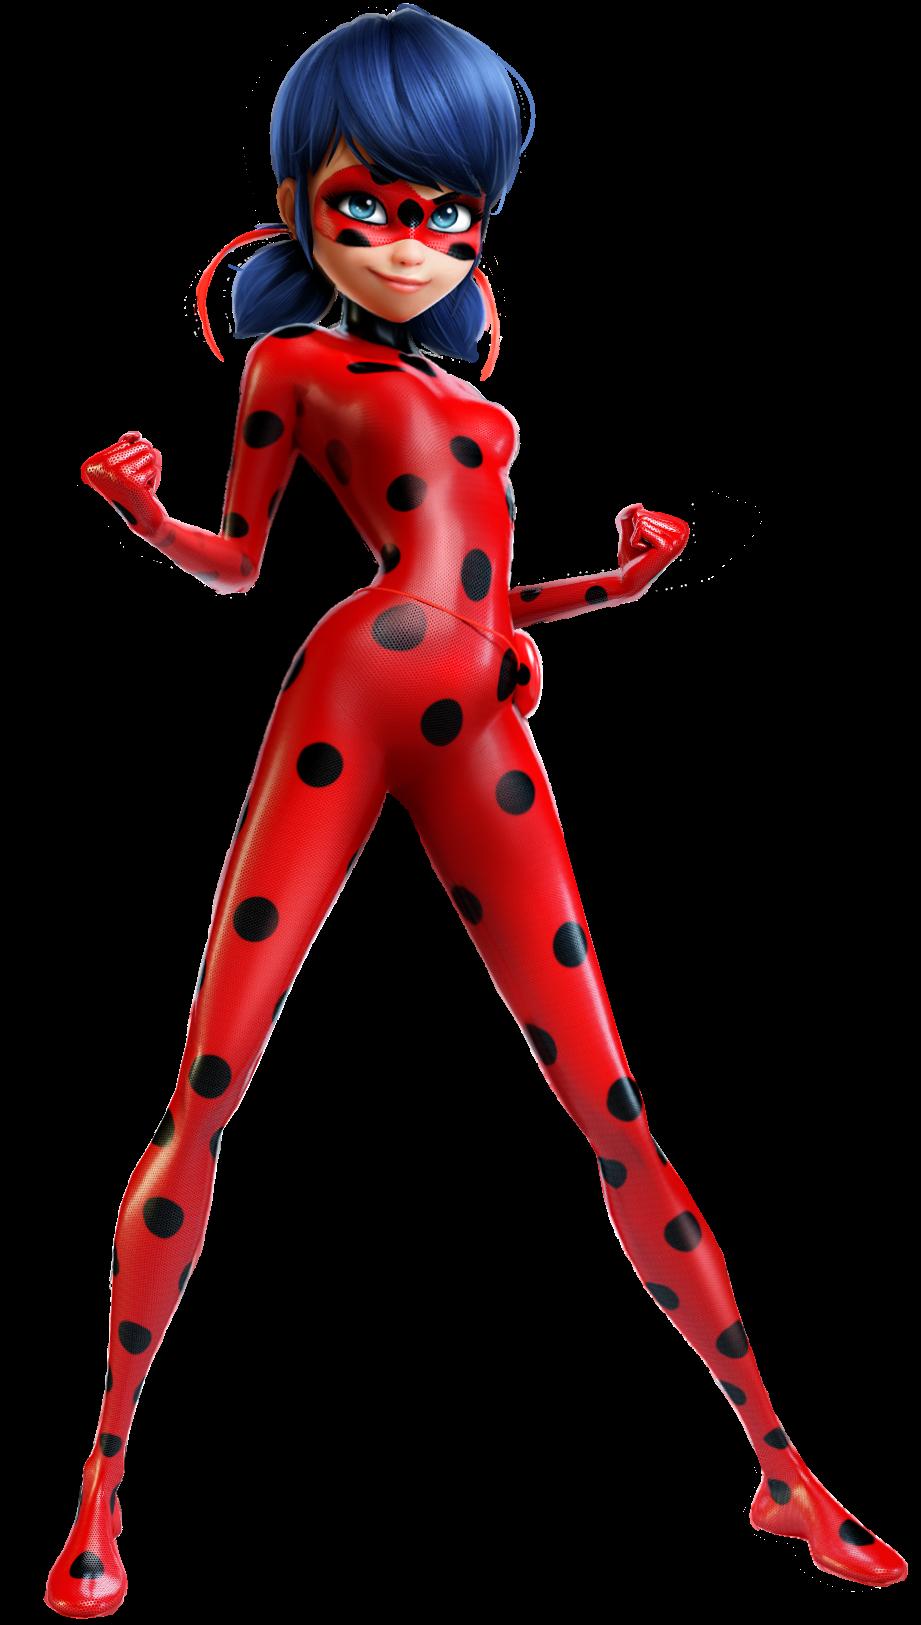 Pin By Aytak Bahar On Return Of The Revenge Of The Kewl Stuffs Miraculous Ladybug Anime Miraculous Ladybug Comic Miraculous Ladybug Oc